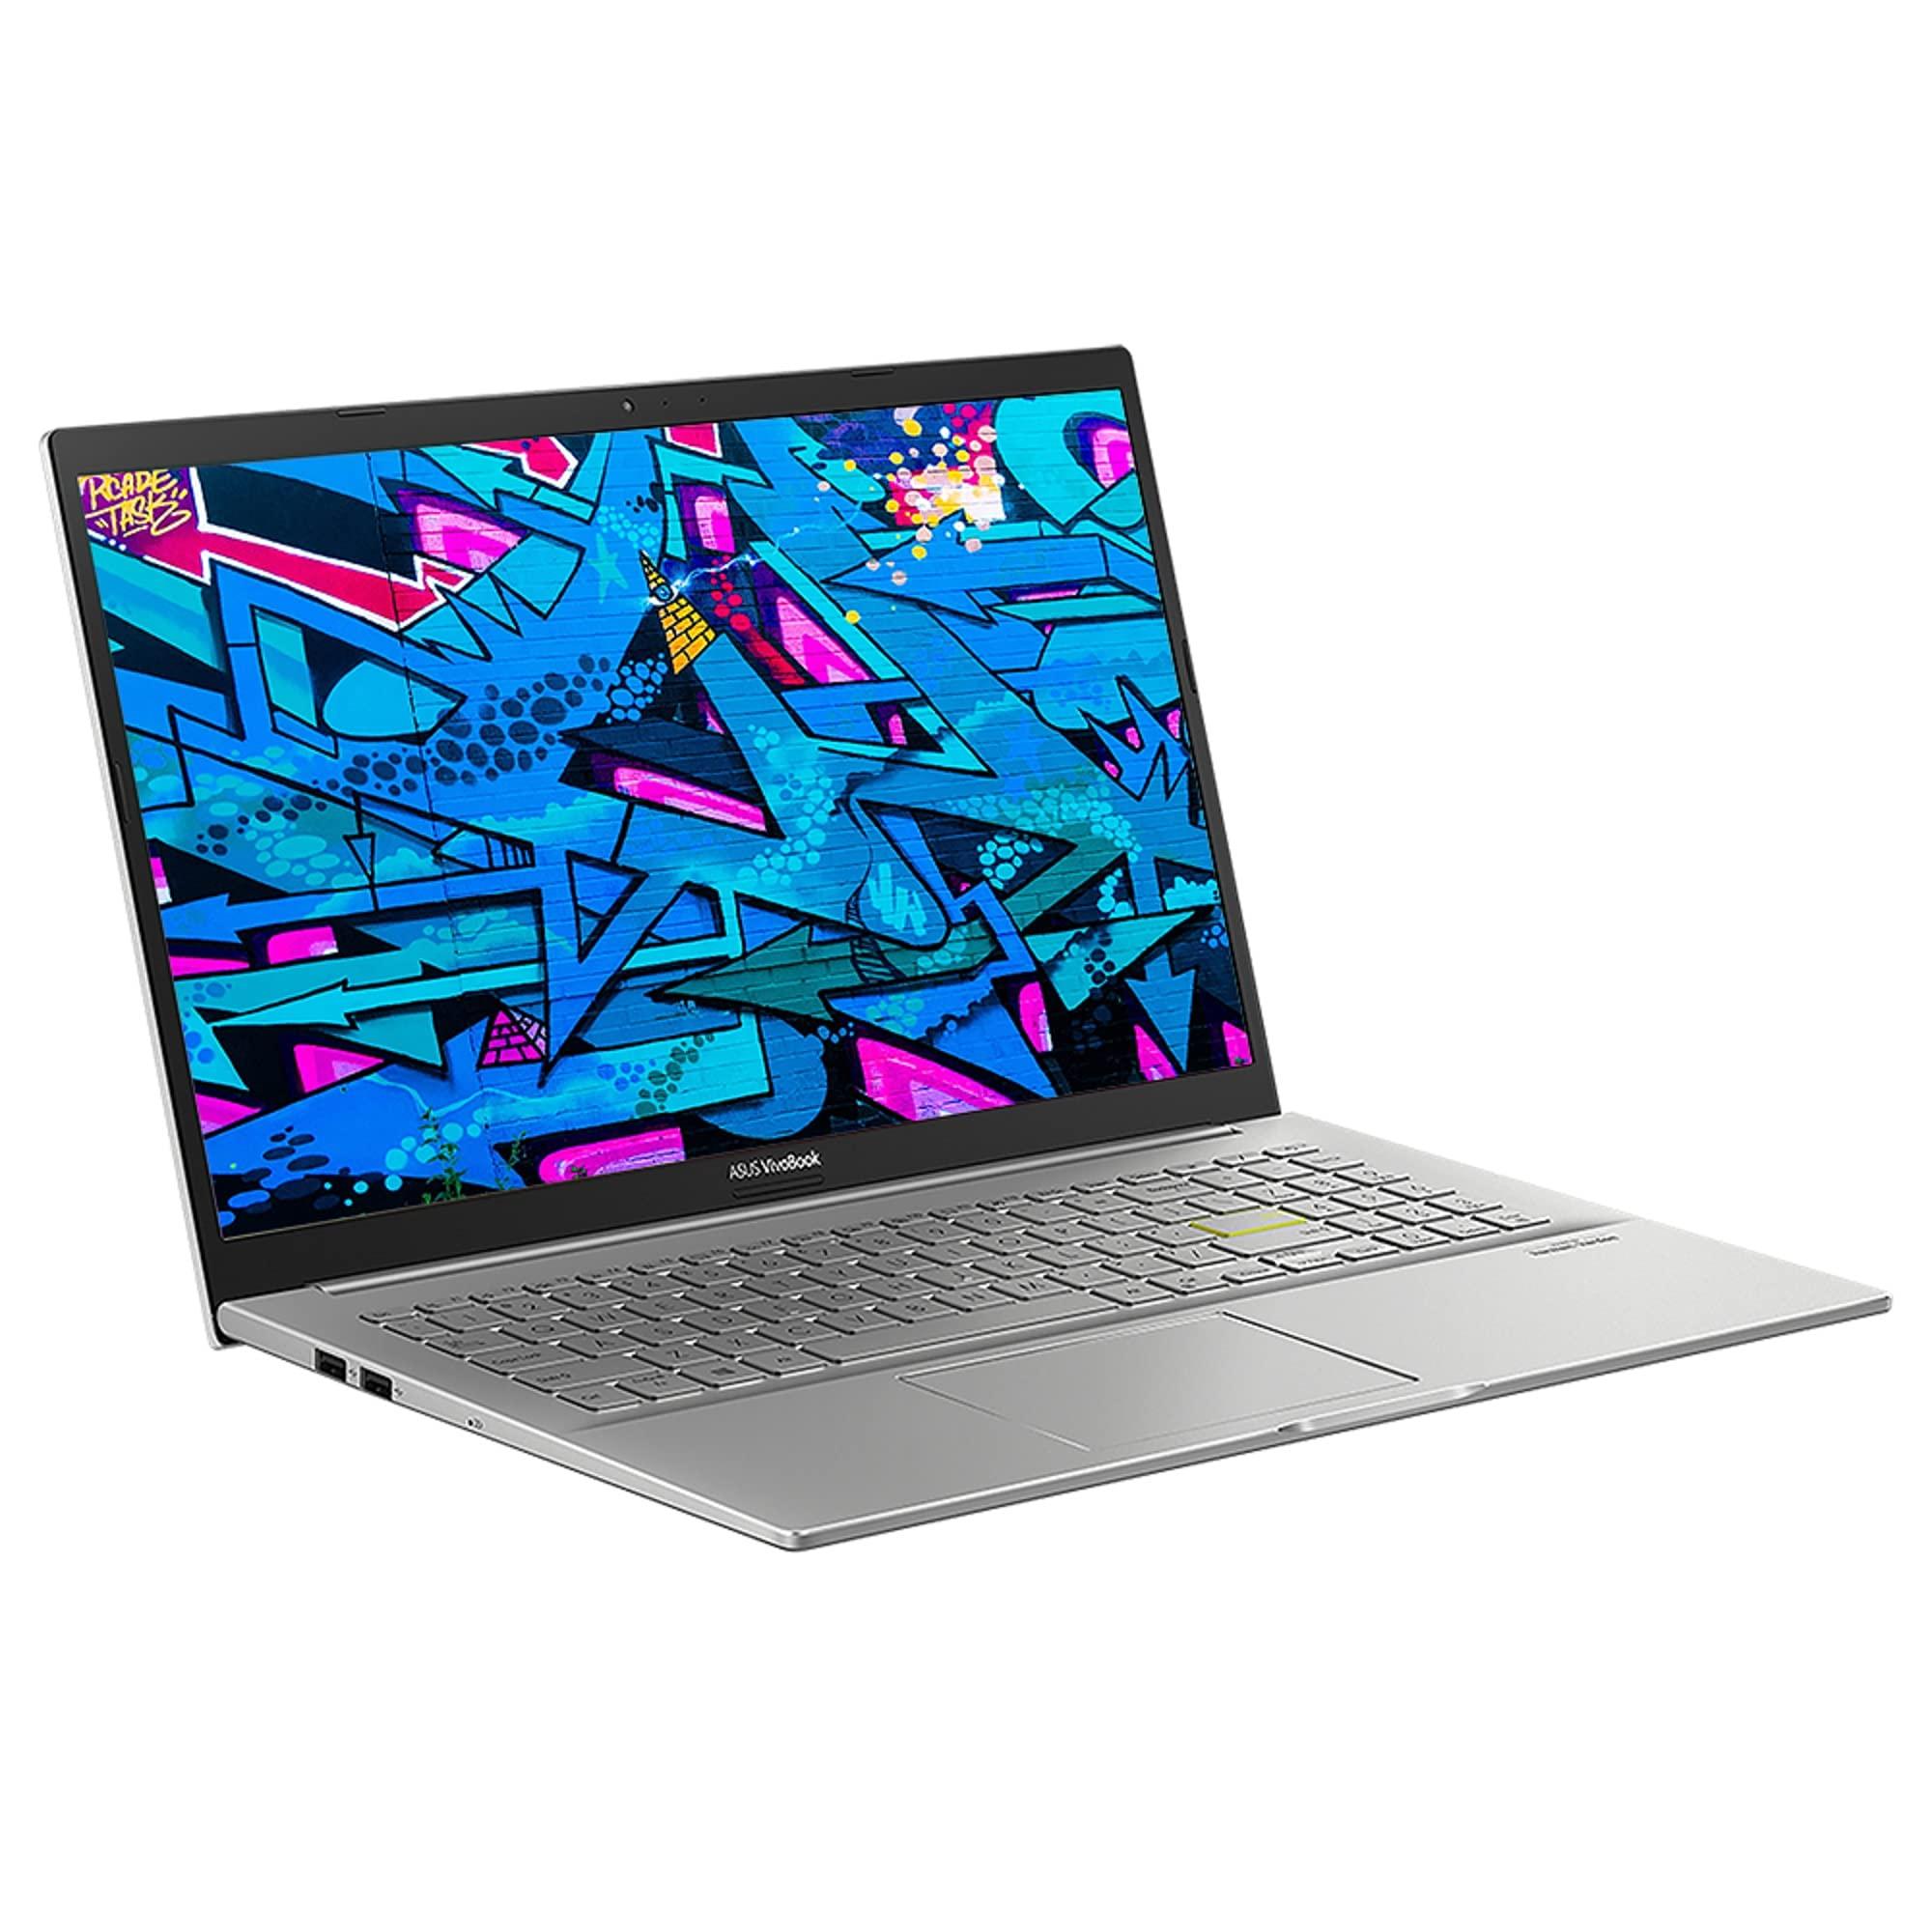 "ASUS VivoBook S 15 - S513EA Full HD 15.6"" Metal Laptop (Intel Quad Core i5-1135G7, 16GB RAM, 512GB SSD, Backlit Keyboard, Windows 10) Includes WiFi 6"